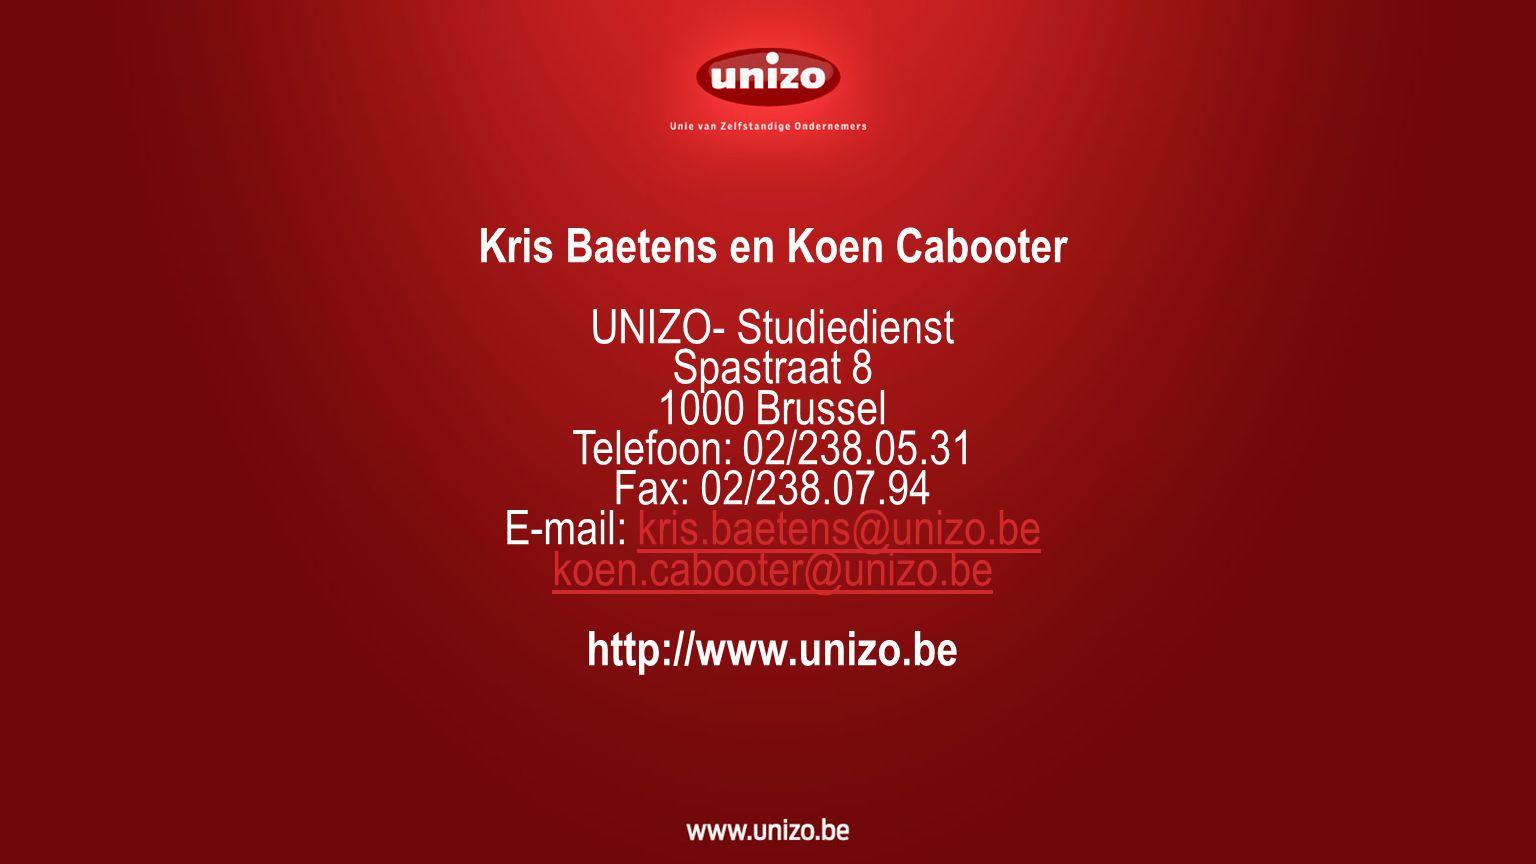 Kris Baetens en Koen Cabooter UNIZO- Studiedienst Spastraat 8 1000 Brussel Telefoon: 02/238.05.31 Fax: 02/238.07.94 E-mail: kris.baetens@unizo.bekris.baetens@unizo.be koen.cabooter@unizo.be koen.cabooter@unizo.be http://www.unizo.be